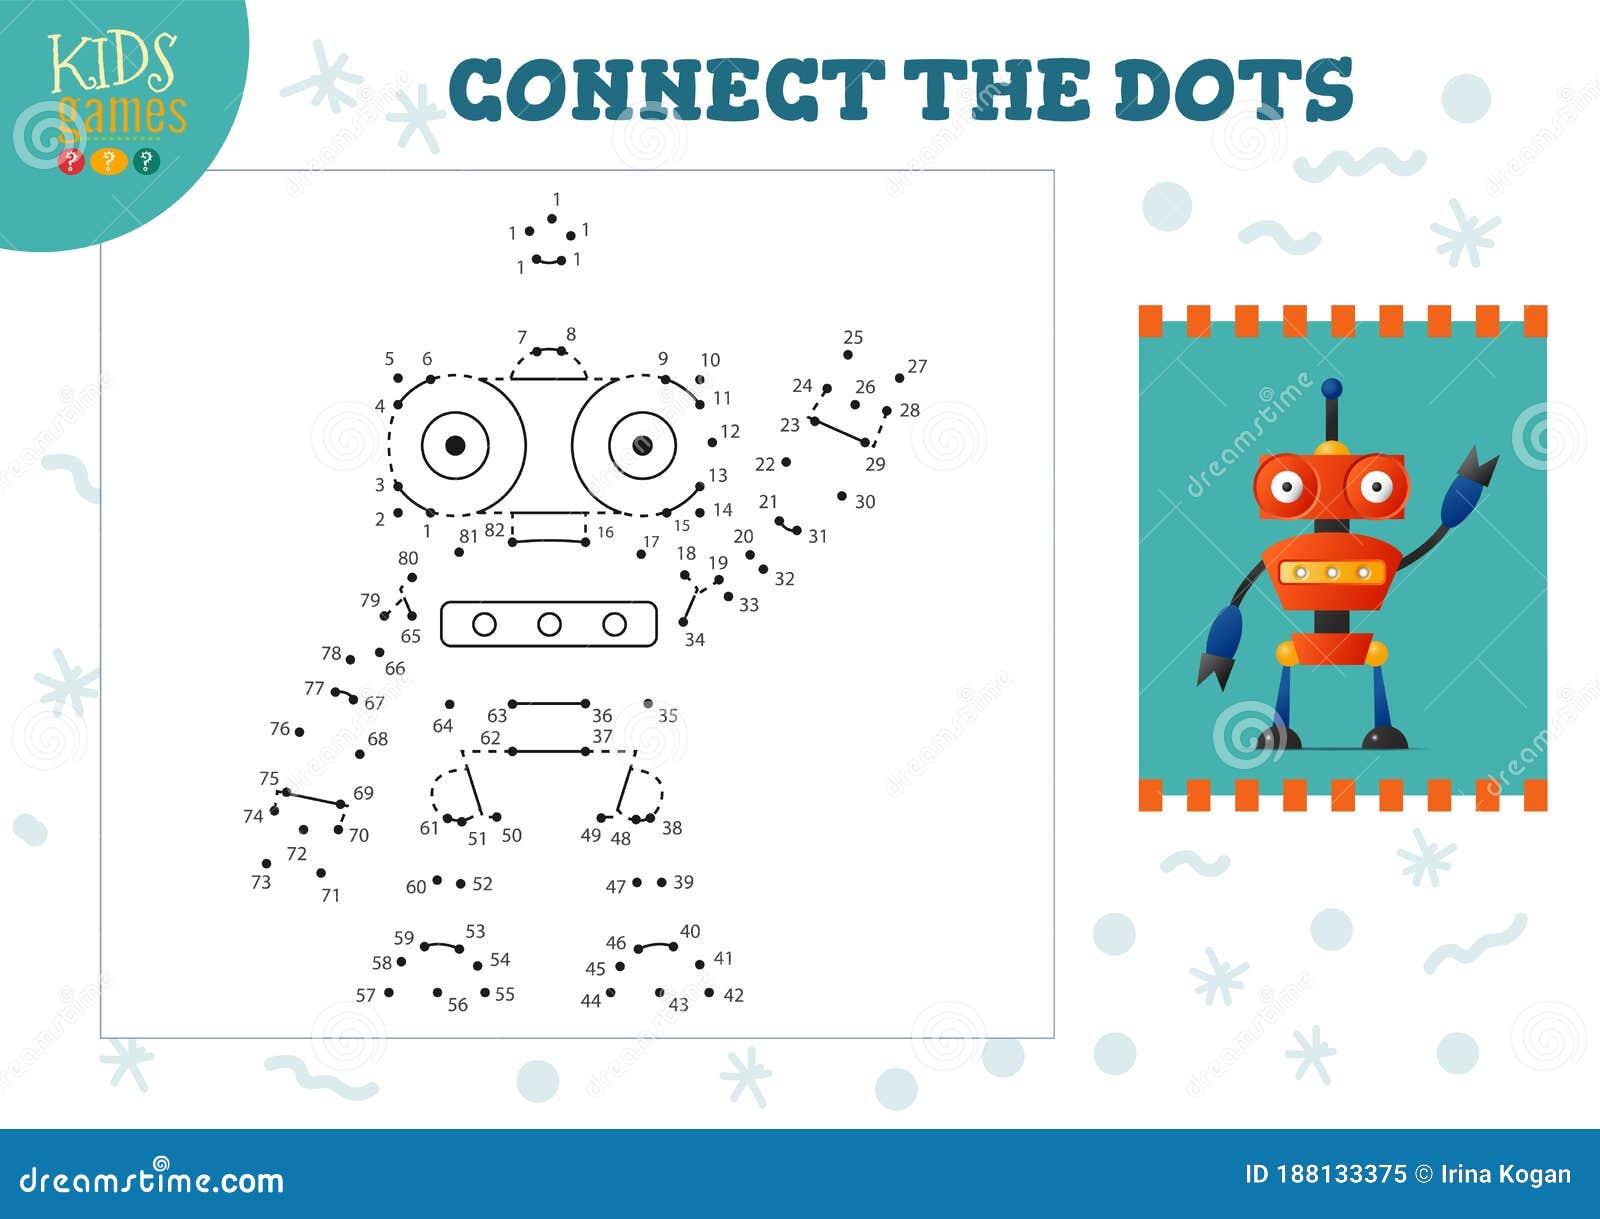 Connect The Dots Kids Game Vector Illustration Kindergarten Children Educational Activity Stock Vector Illustration Of Dottodot Educational 188133375 - View Connect The Dots Worksheets For Kindergarten Gif